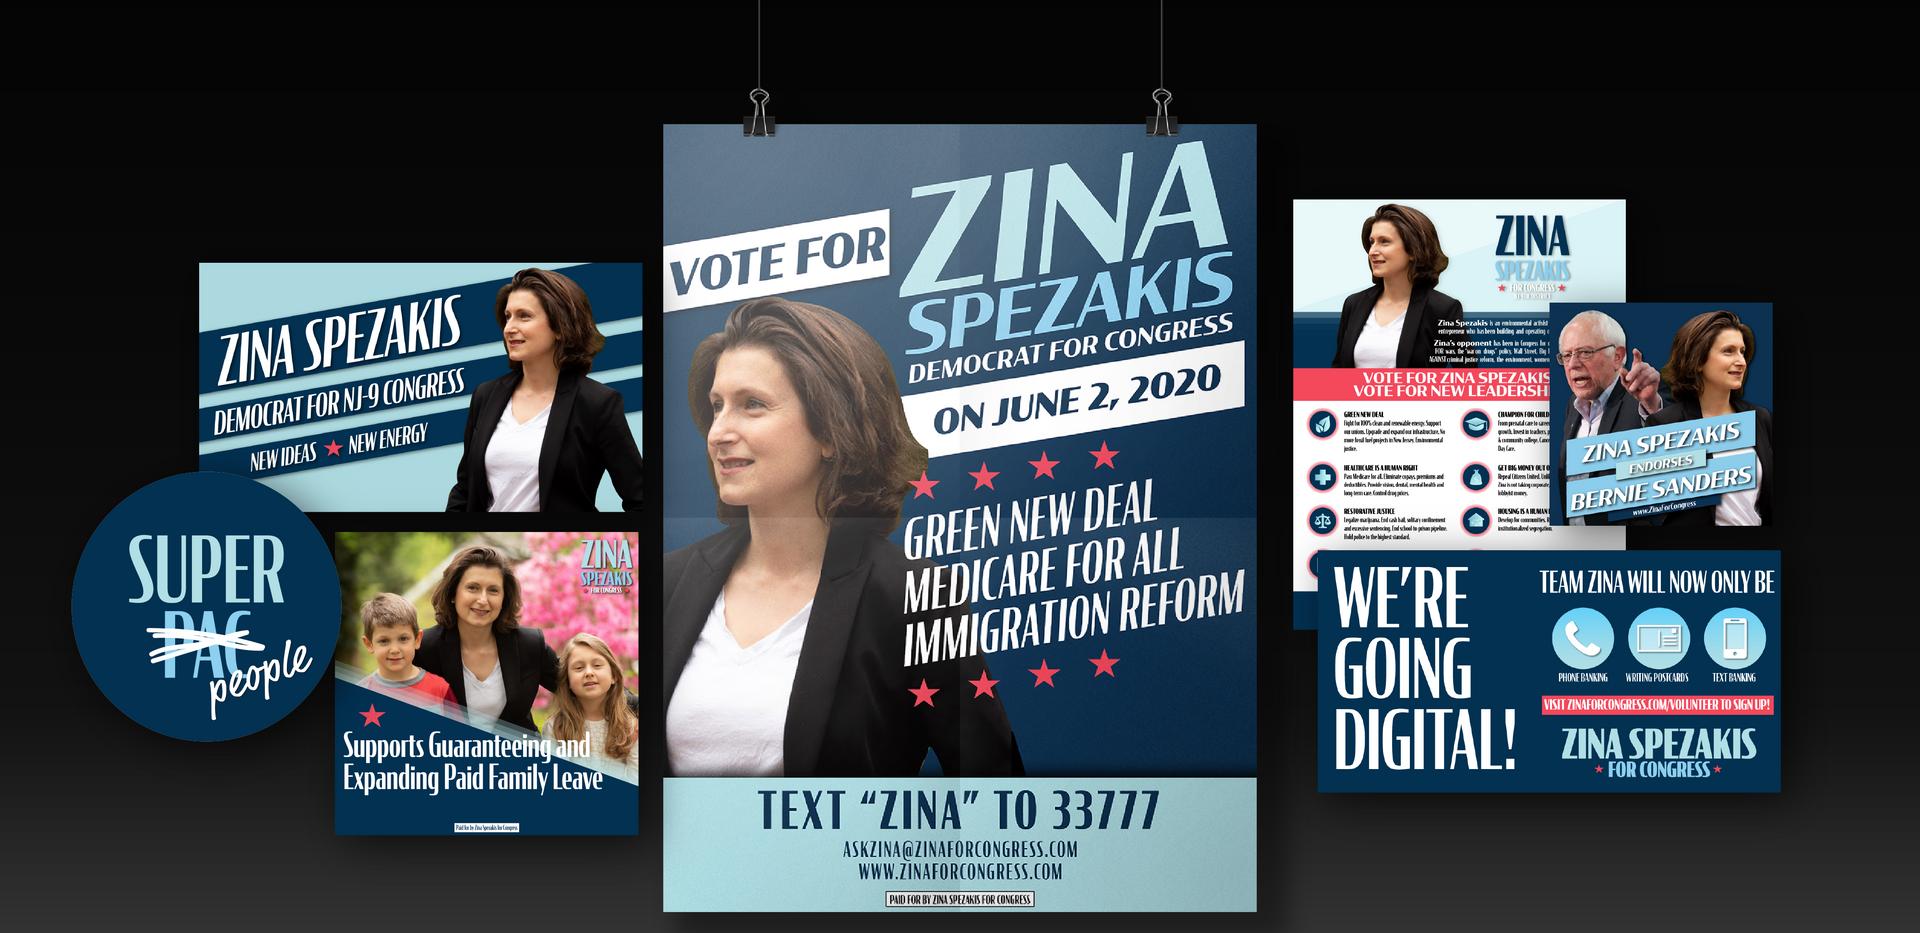 Zina Spezakis for Congress